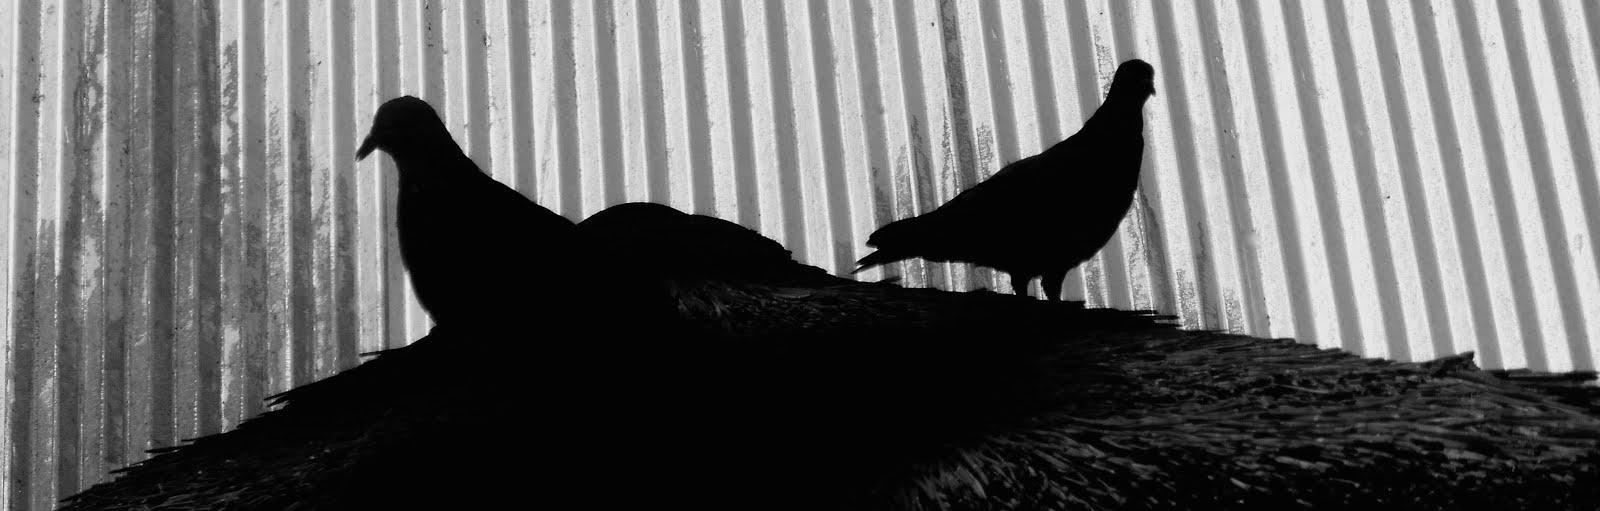 Silhouette Birds